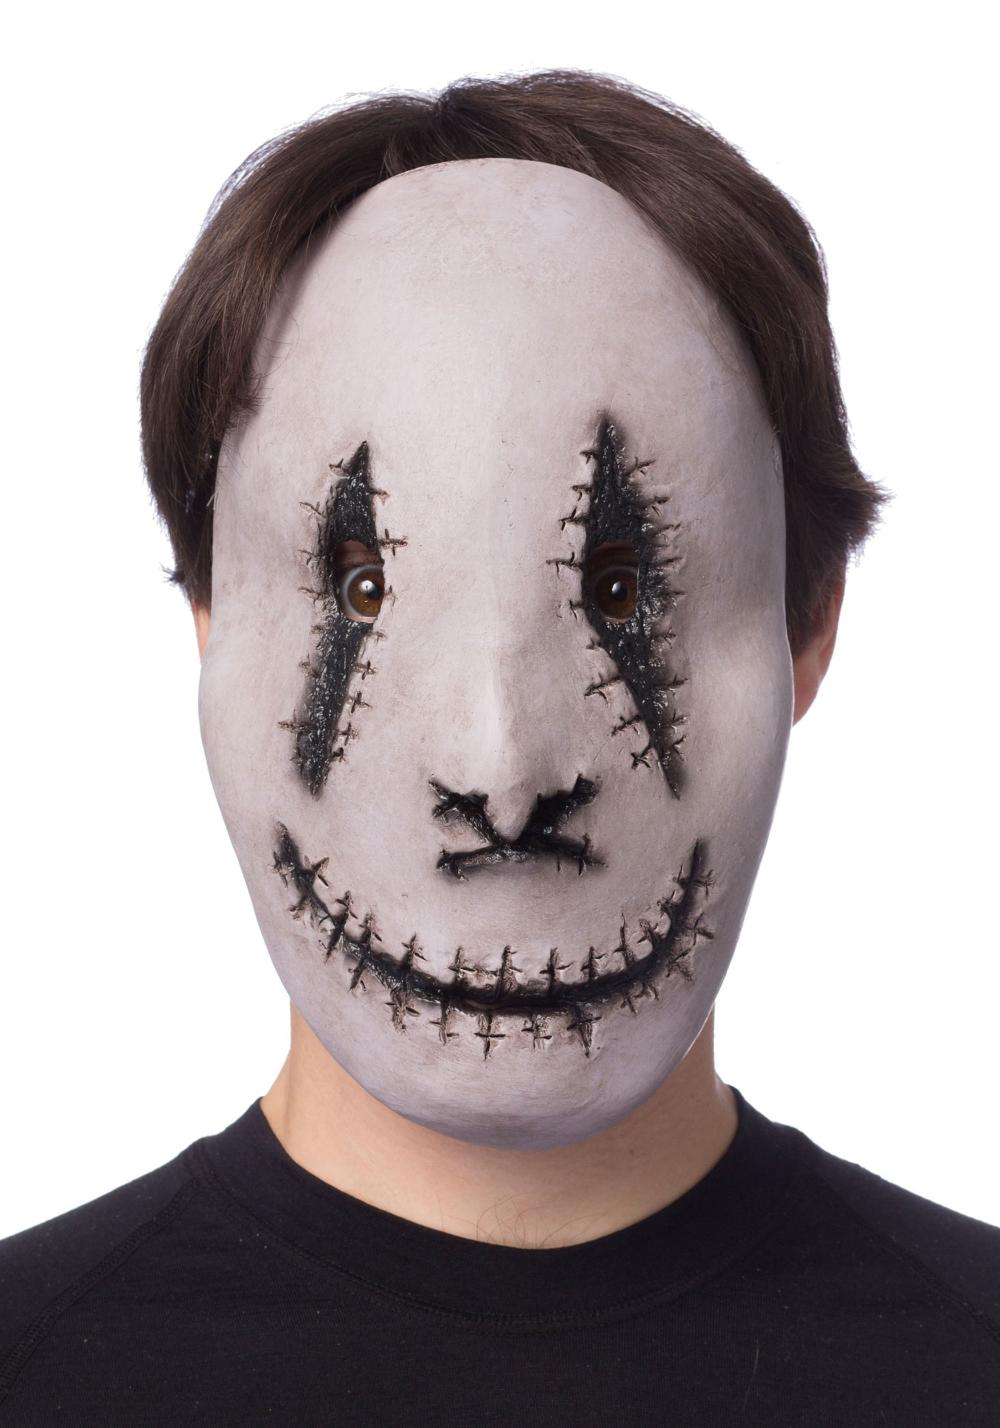 Smiley Mask Forever Halloween Halloween Accessories Halloween Makeup Inspiration Creepy Faces